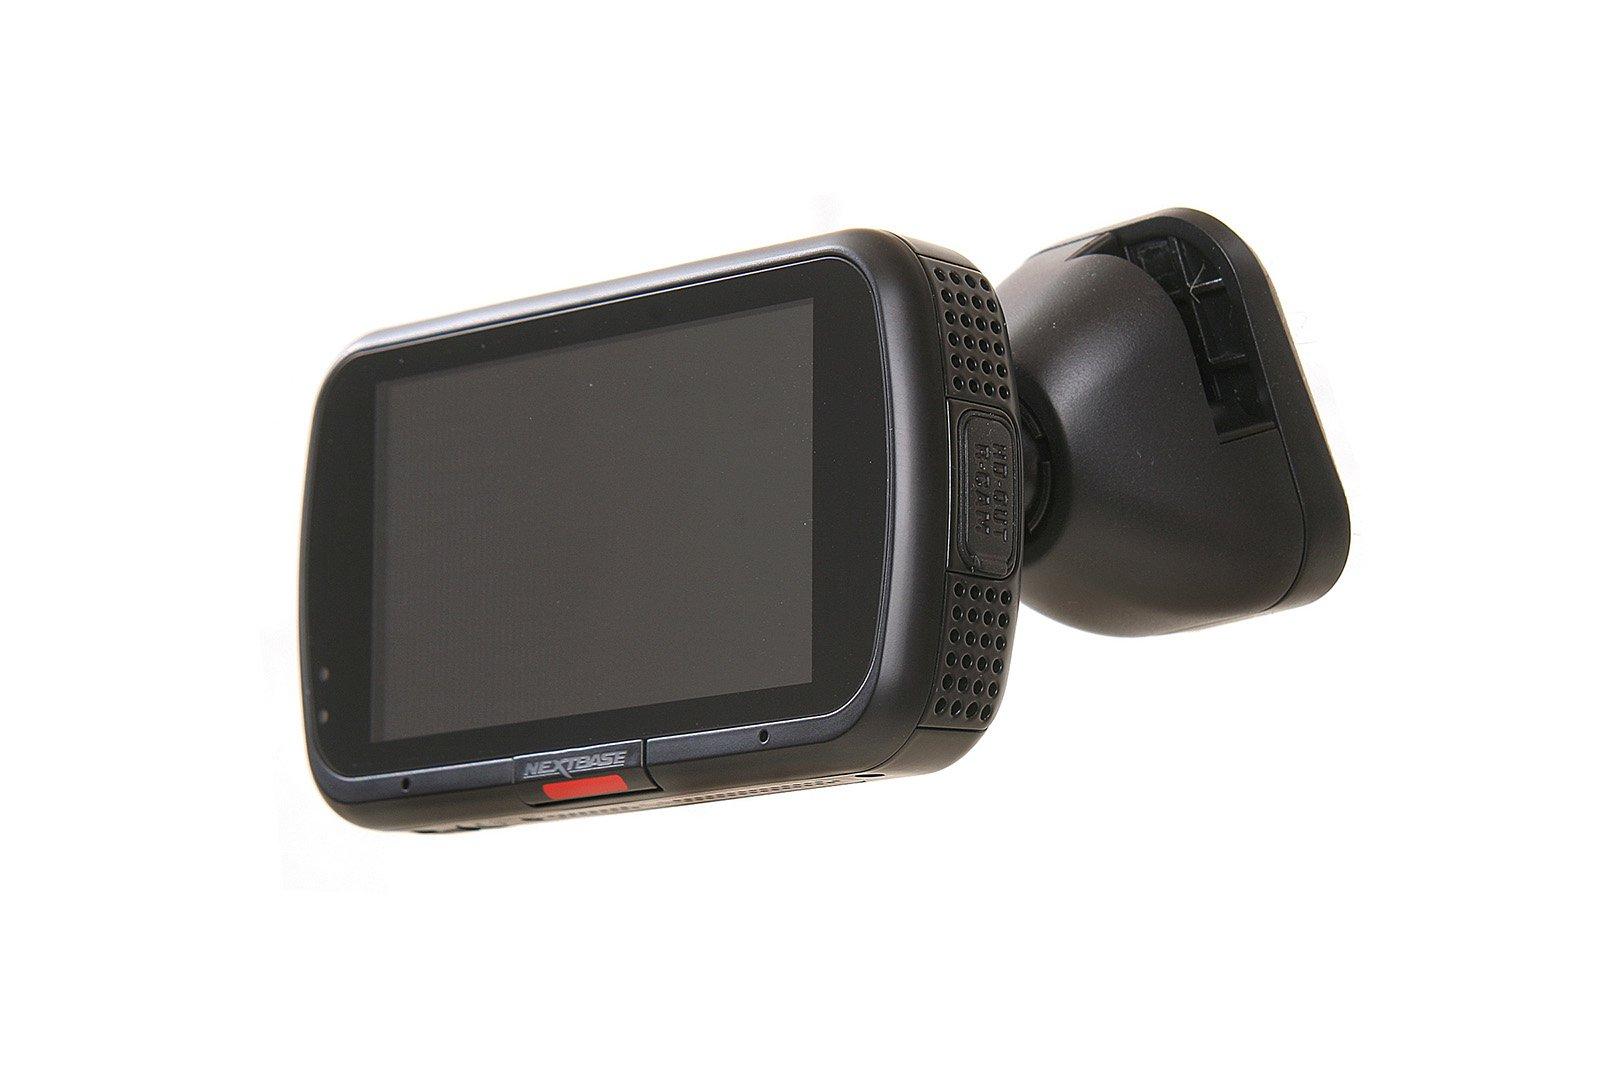 Dash cam NextBase 522GW